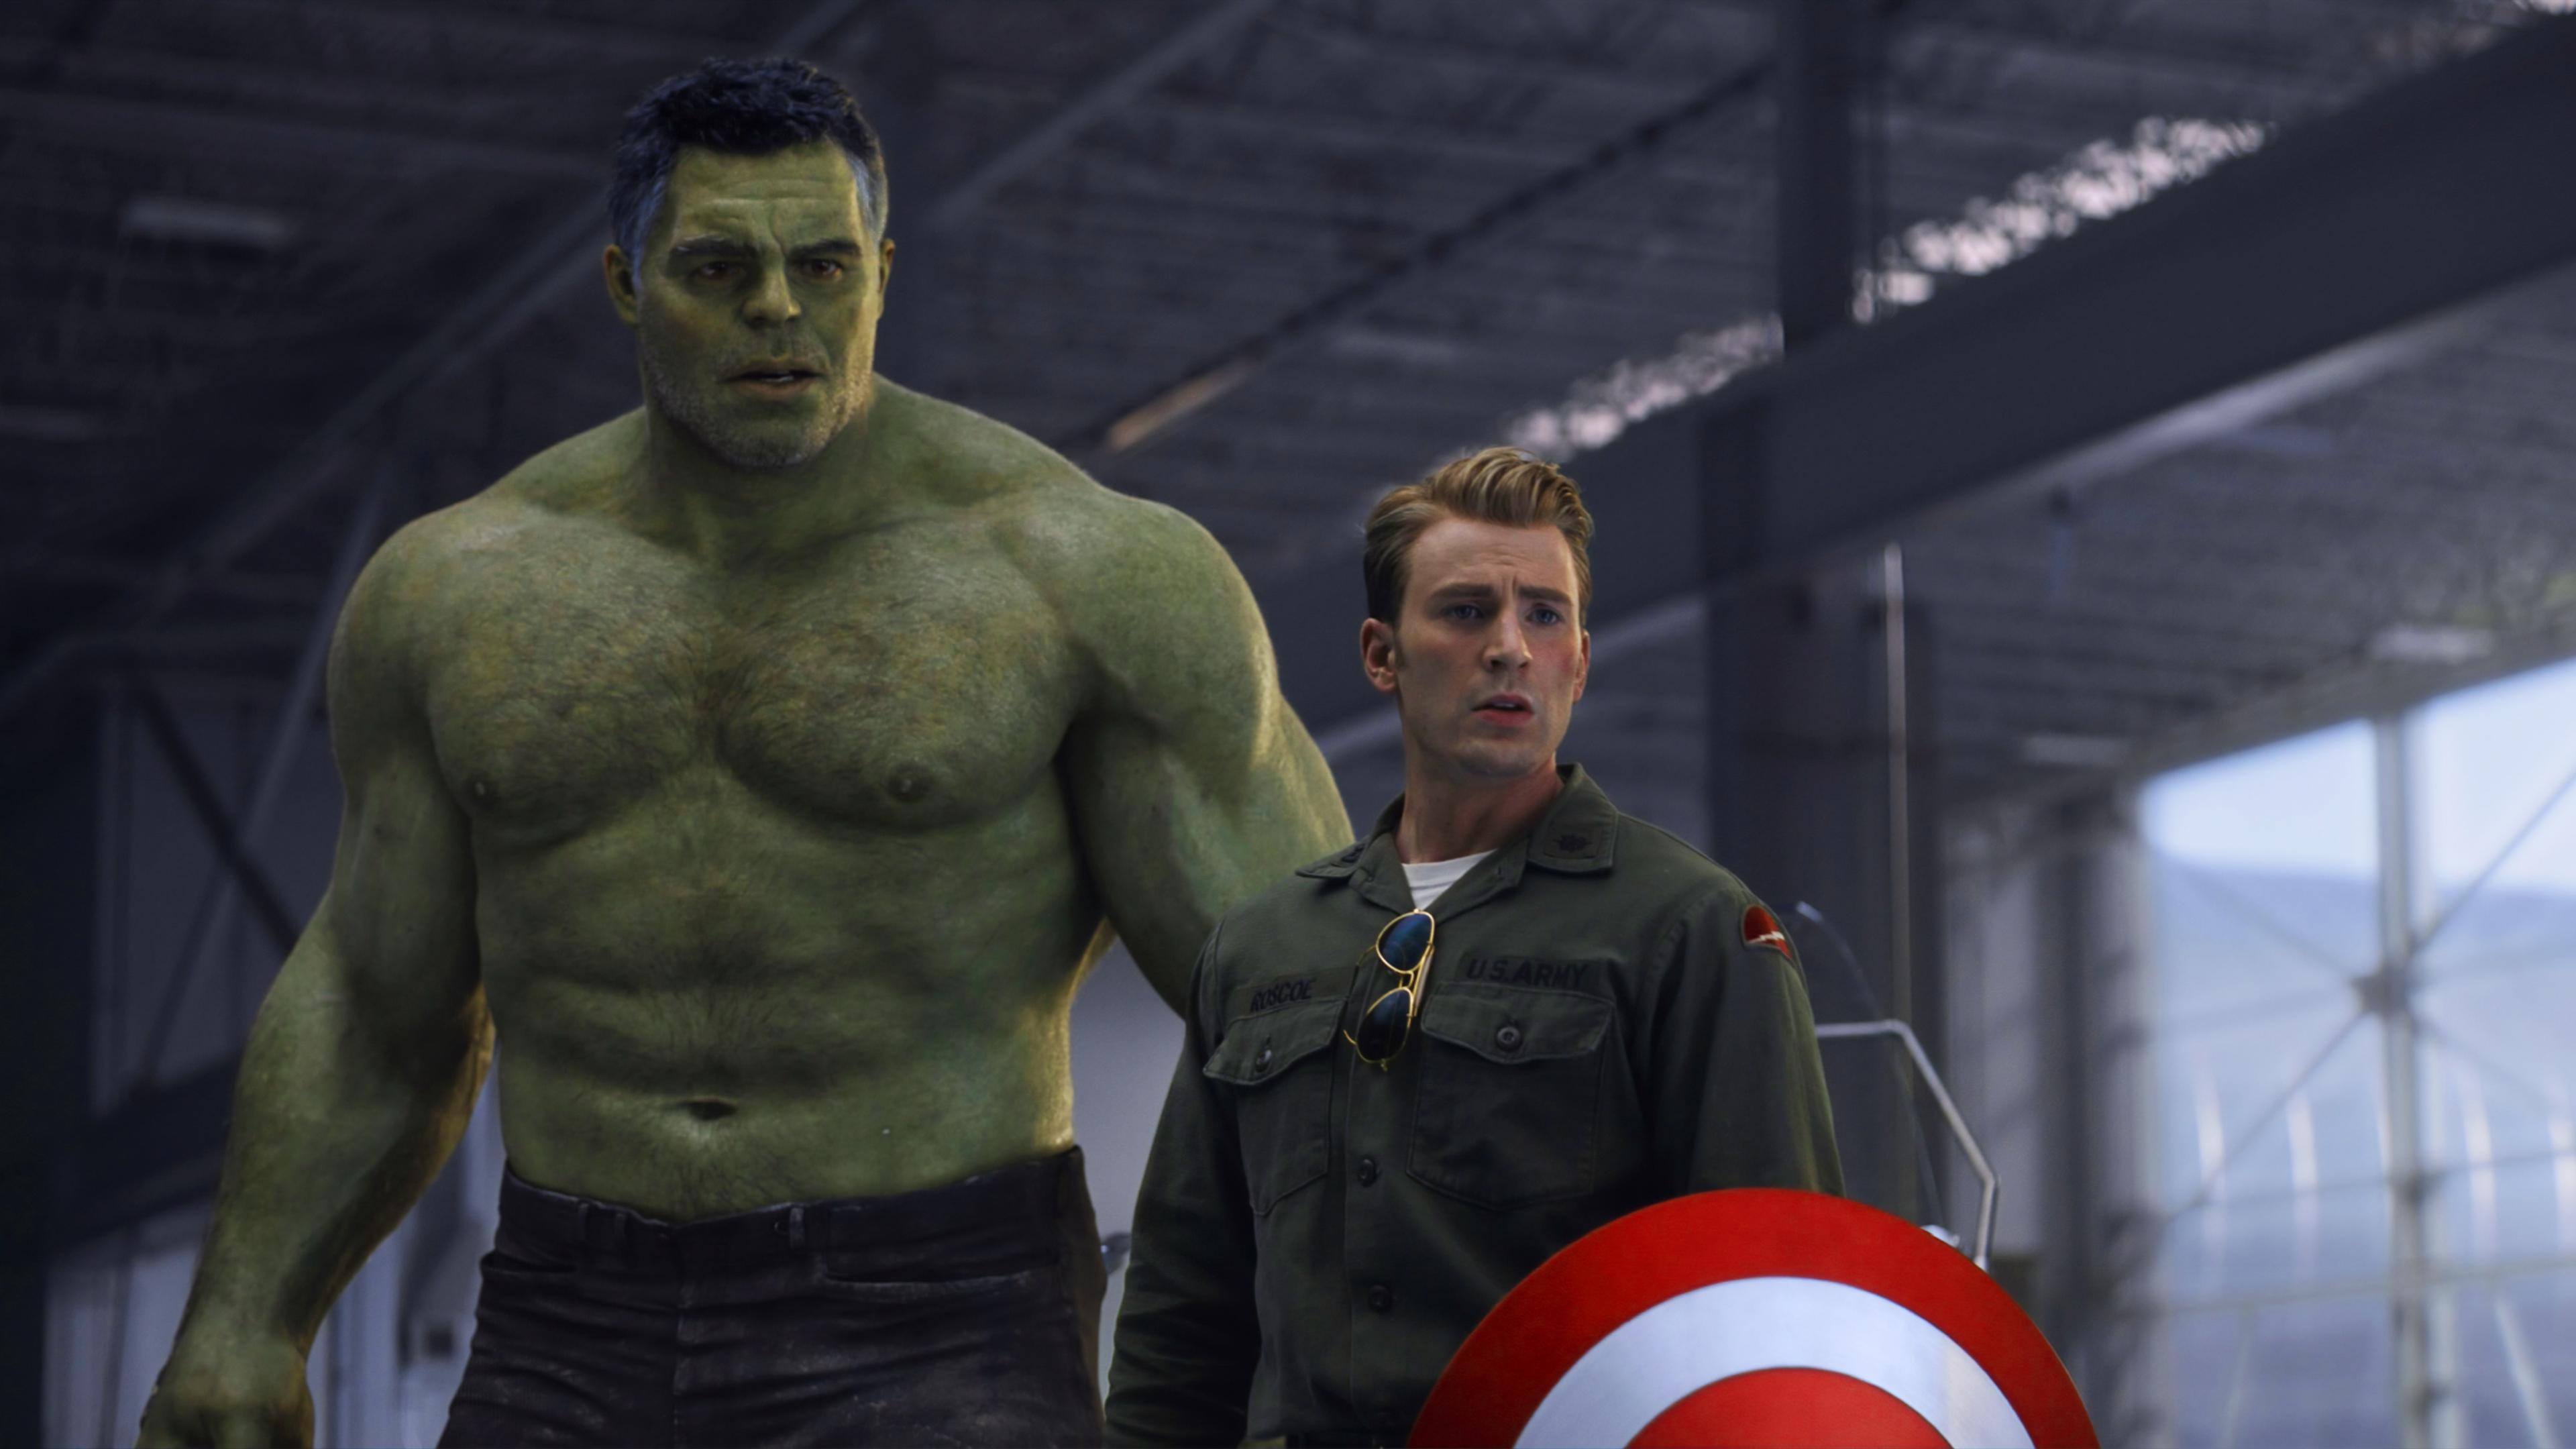 captain america and hulk time travel avengers end game 1560535043 - Captain America And Hulk Time Travel Avengers End Game - movies wallpapers, hulk wallpapers, hd-wallpapers, captain america wallpapers, avengers end game wallpapers, 4k-wallpapers